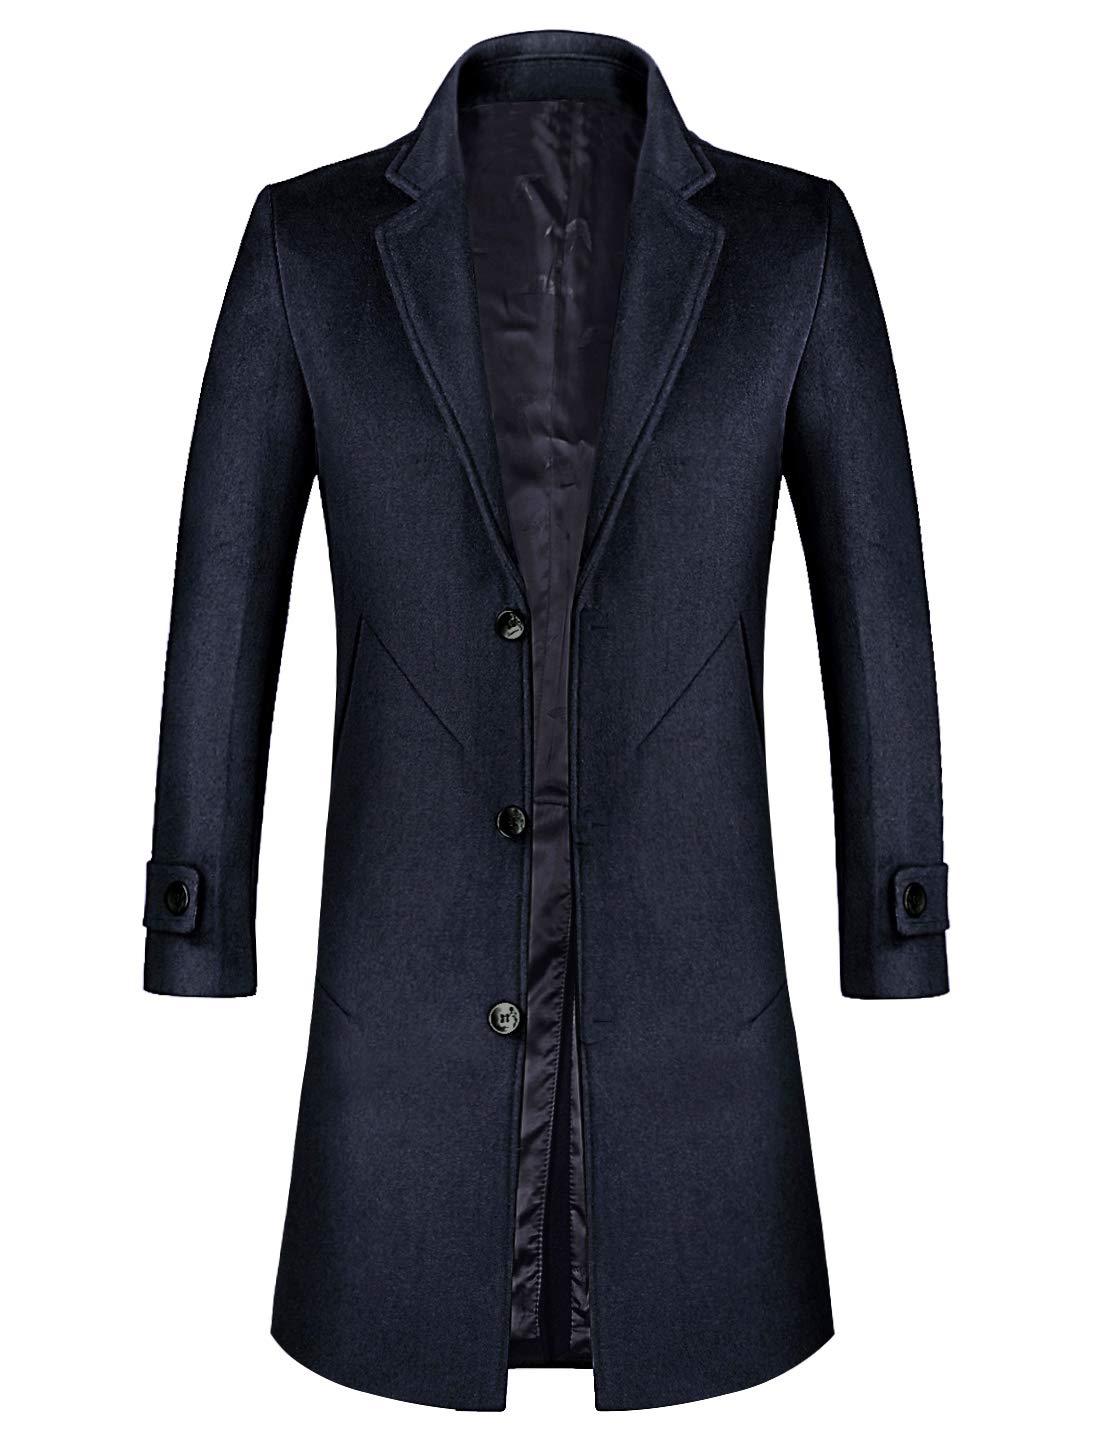 zeetoo Men's Wool Trench Coat Winter Slim Fit Wool Jacket Long Peacoat Overcoat Blue-Black Medium by zeetoo